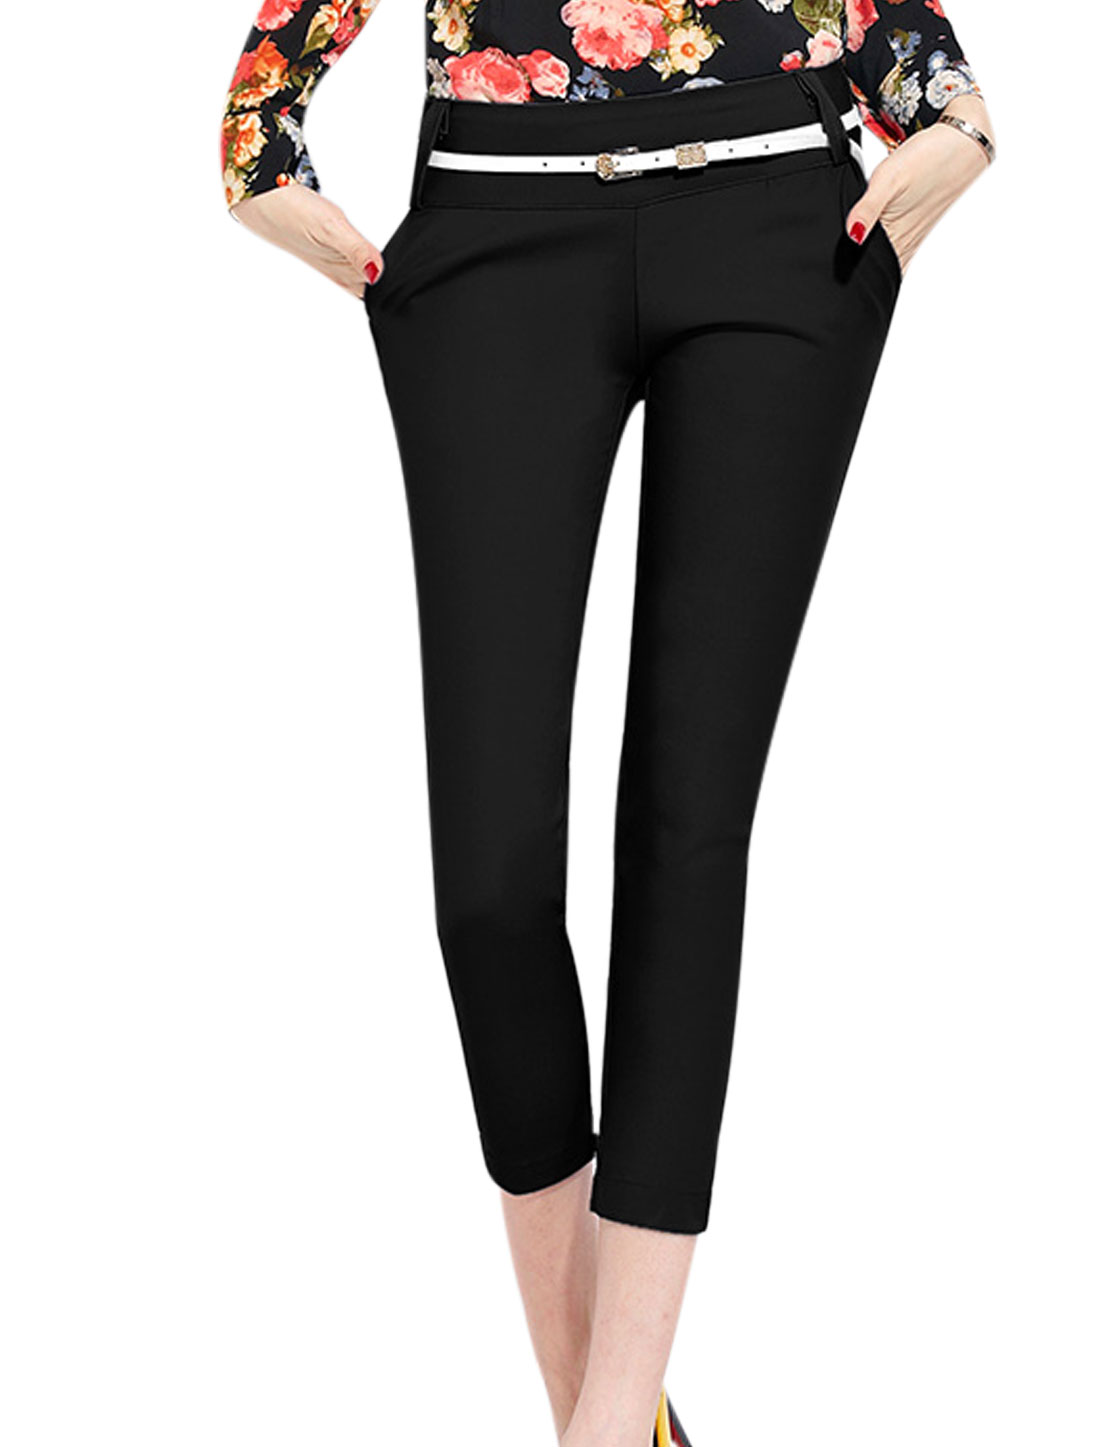 Lady Hidden Zipper Side Double Slant Pockets Casual Cropped Pants Black M